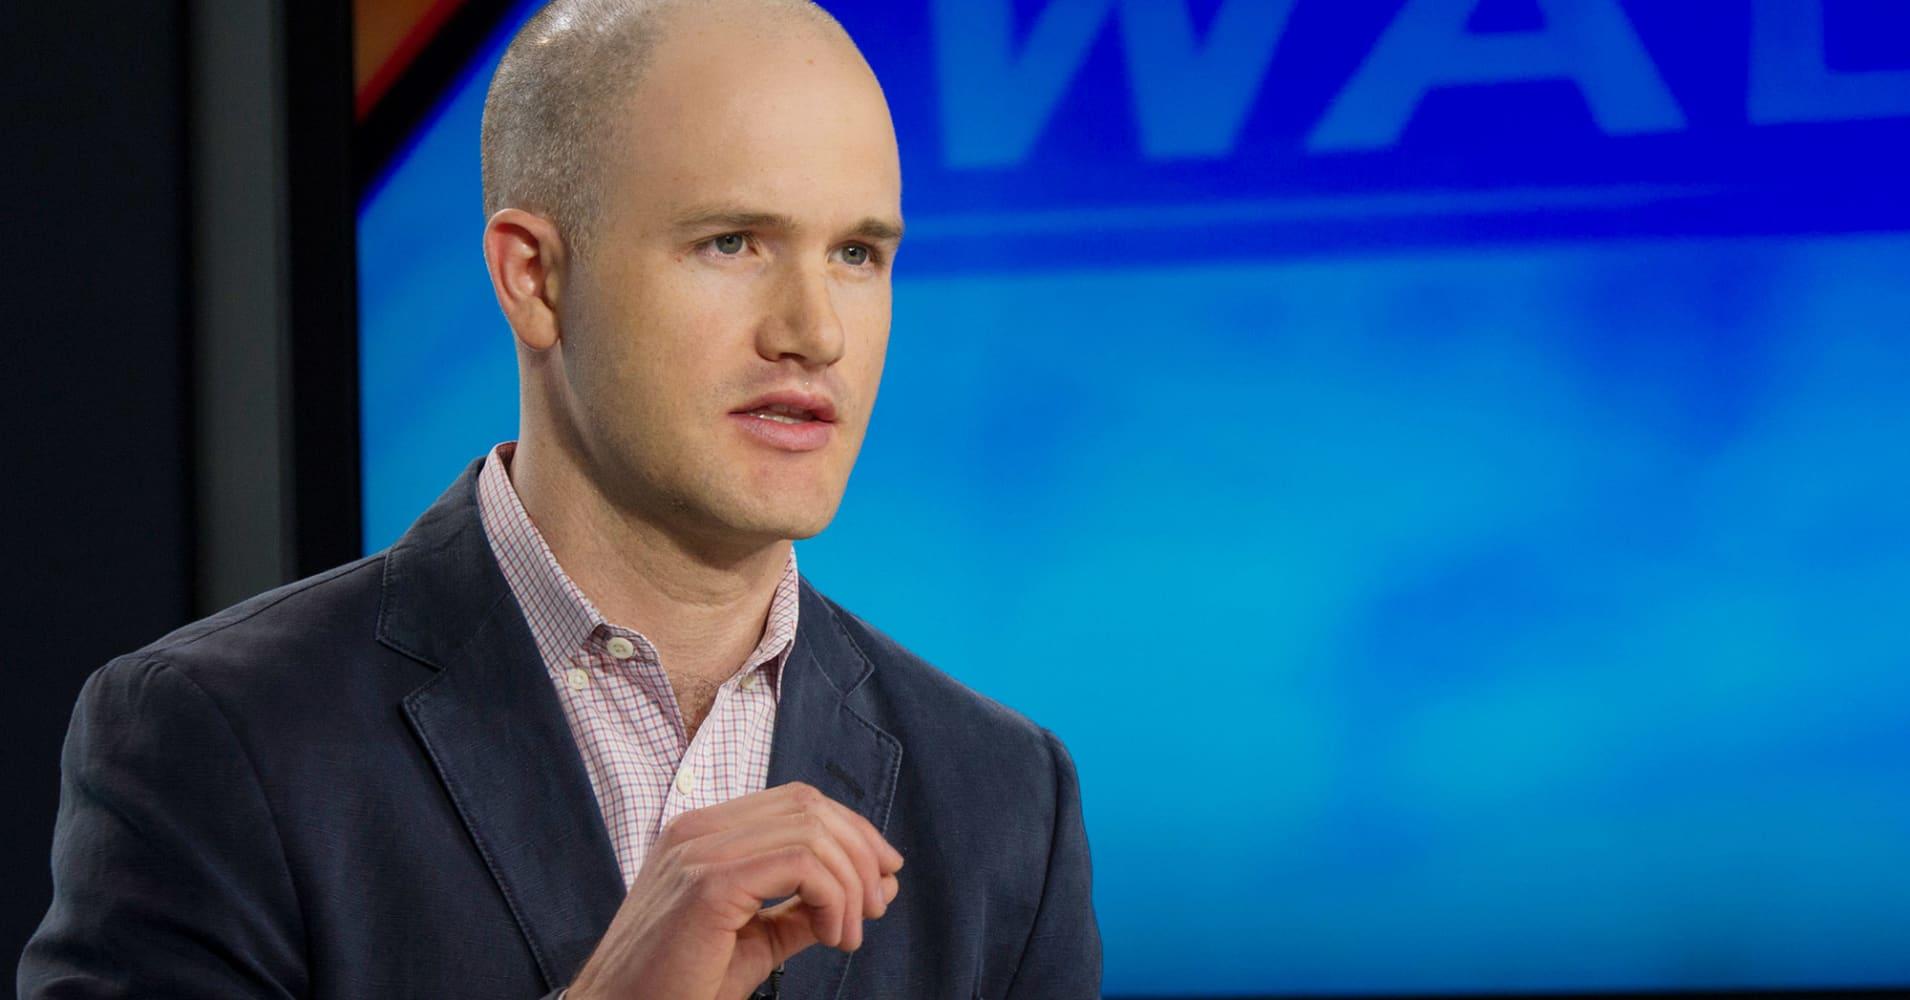 Bitcoin start-up Coinbase aims for $1 billion valuation - CNBC.com - CNBC